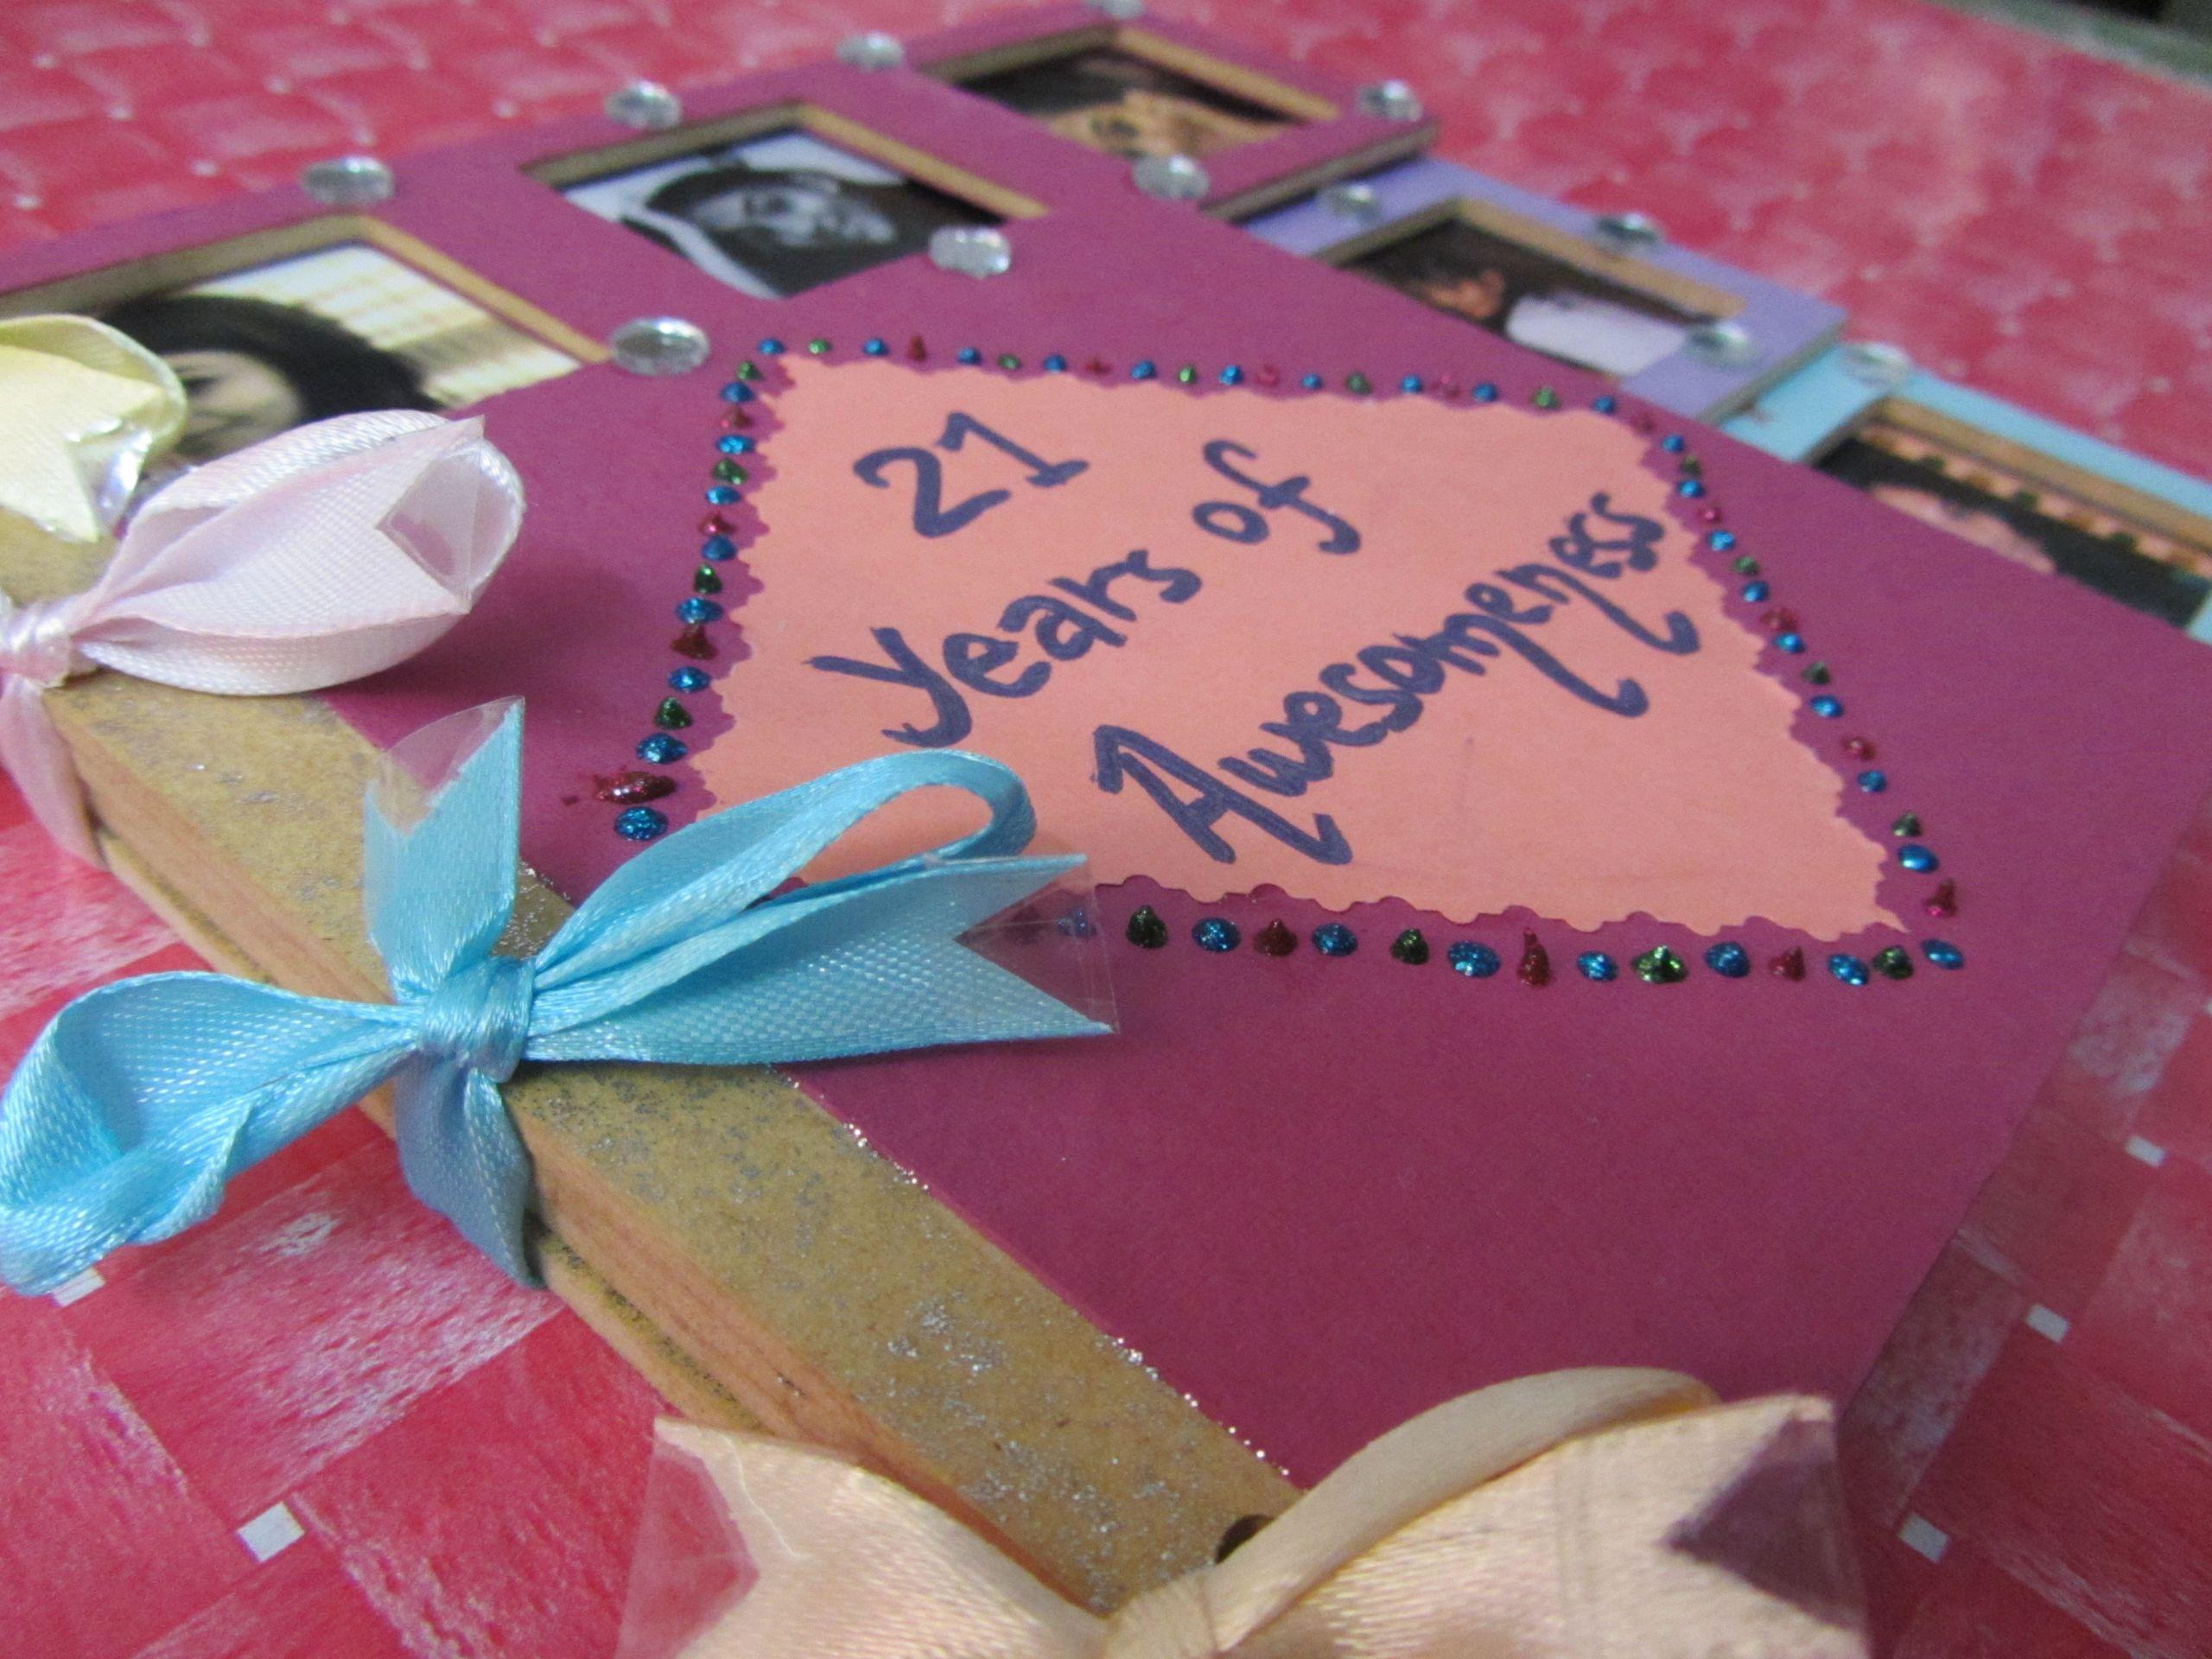 Best Friends Birthday Gifts  Scrapbook for my Best Friend's Birthday – The Artful Butterfly